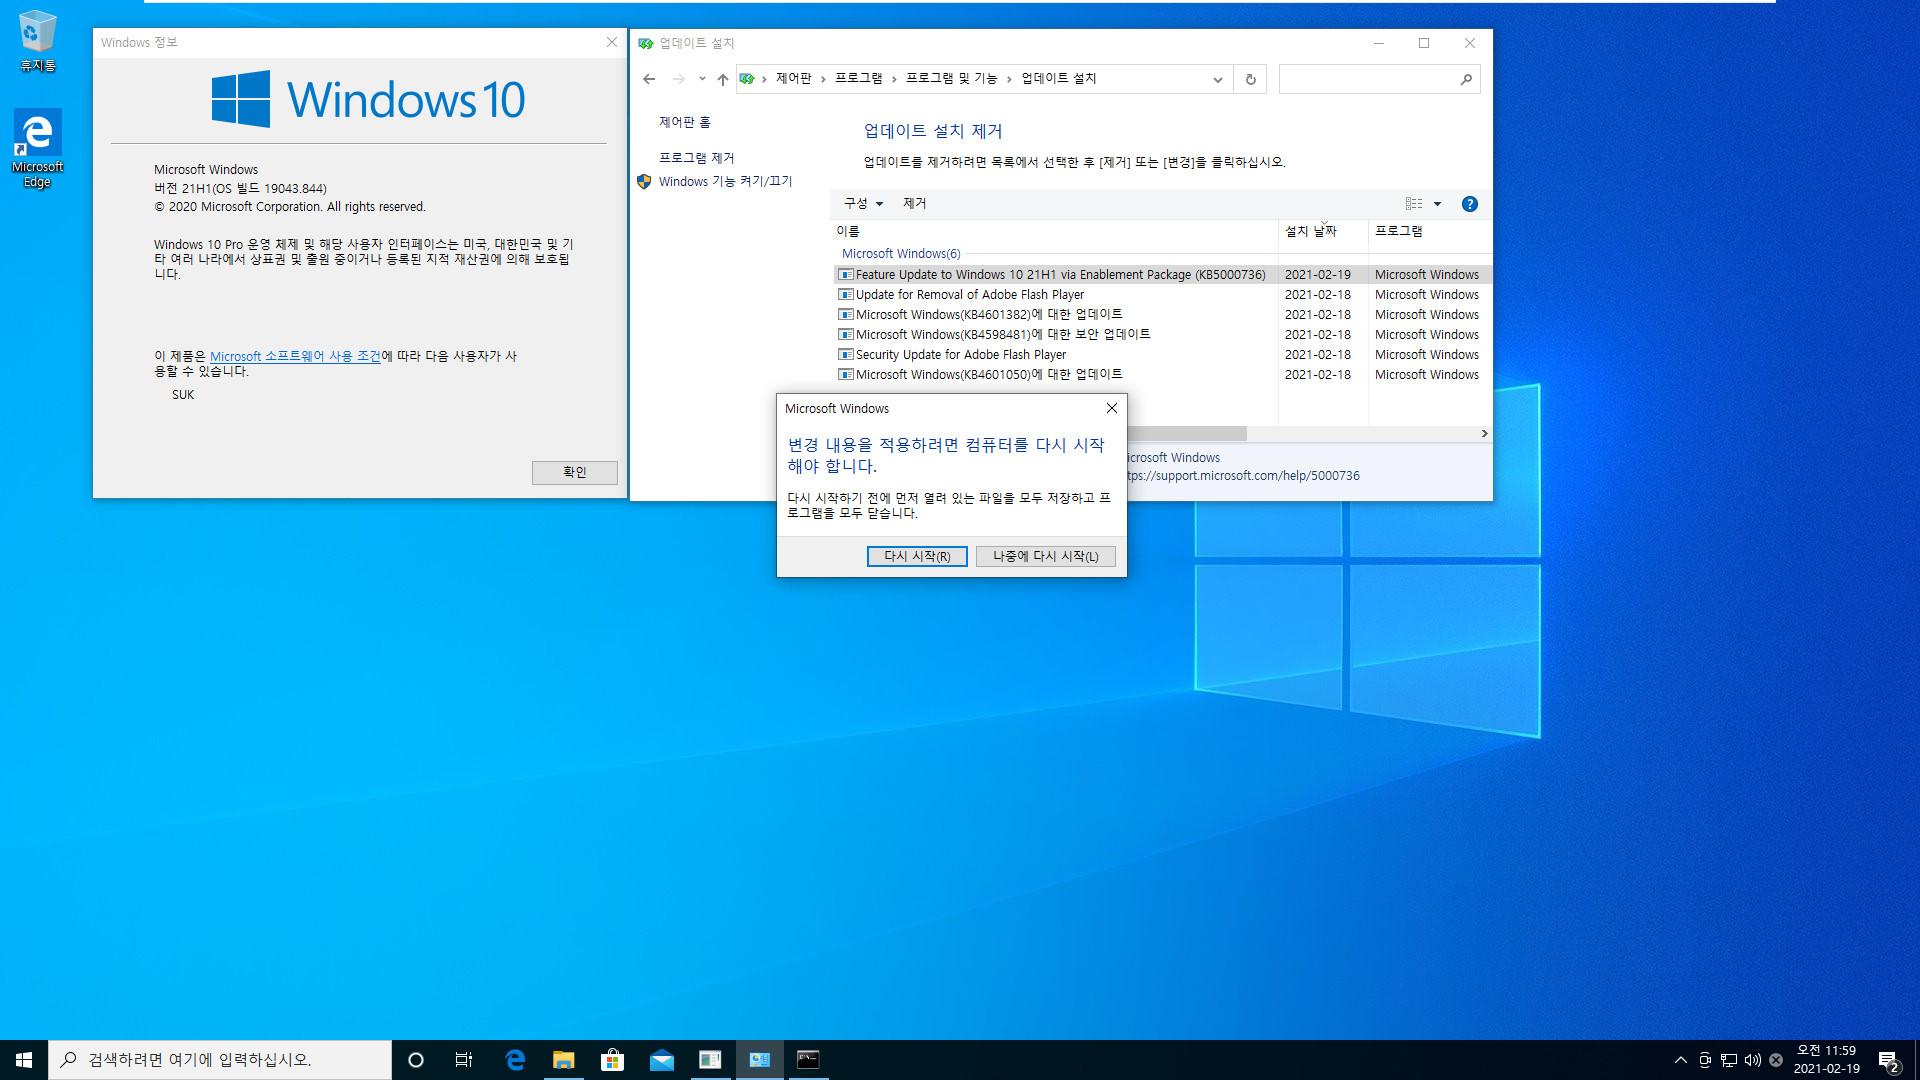 Windows 10 버전 21H1, 19043 빌드로 업그레이드 테스트 - 버전 20H2만 아니라, 버전 2004 에서도 KB5000736 제거하면 원래 버전으로 돌아갑니다 2021-02-19_115938.jpg